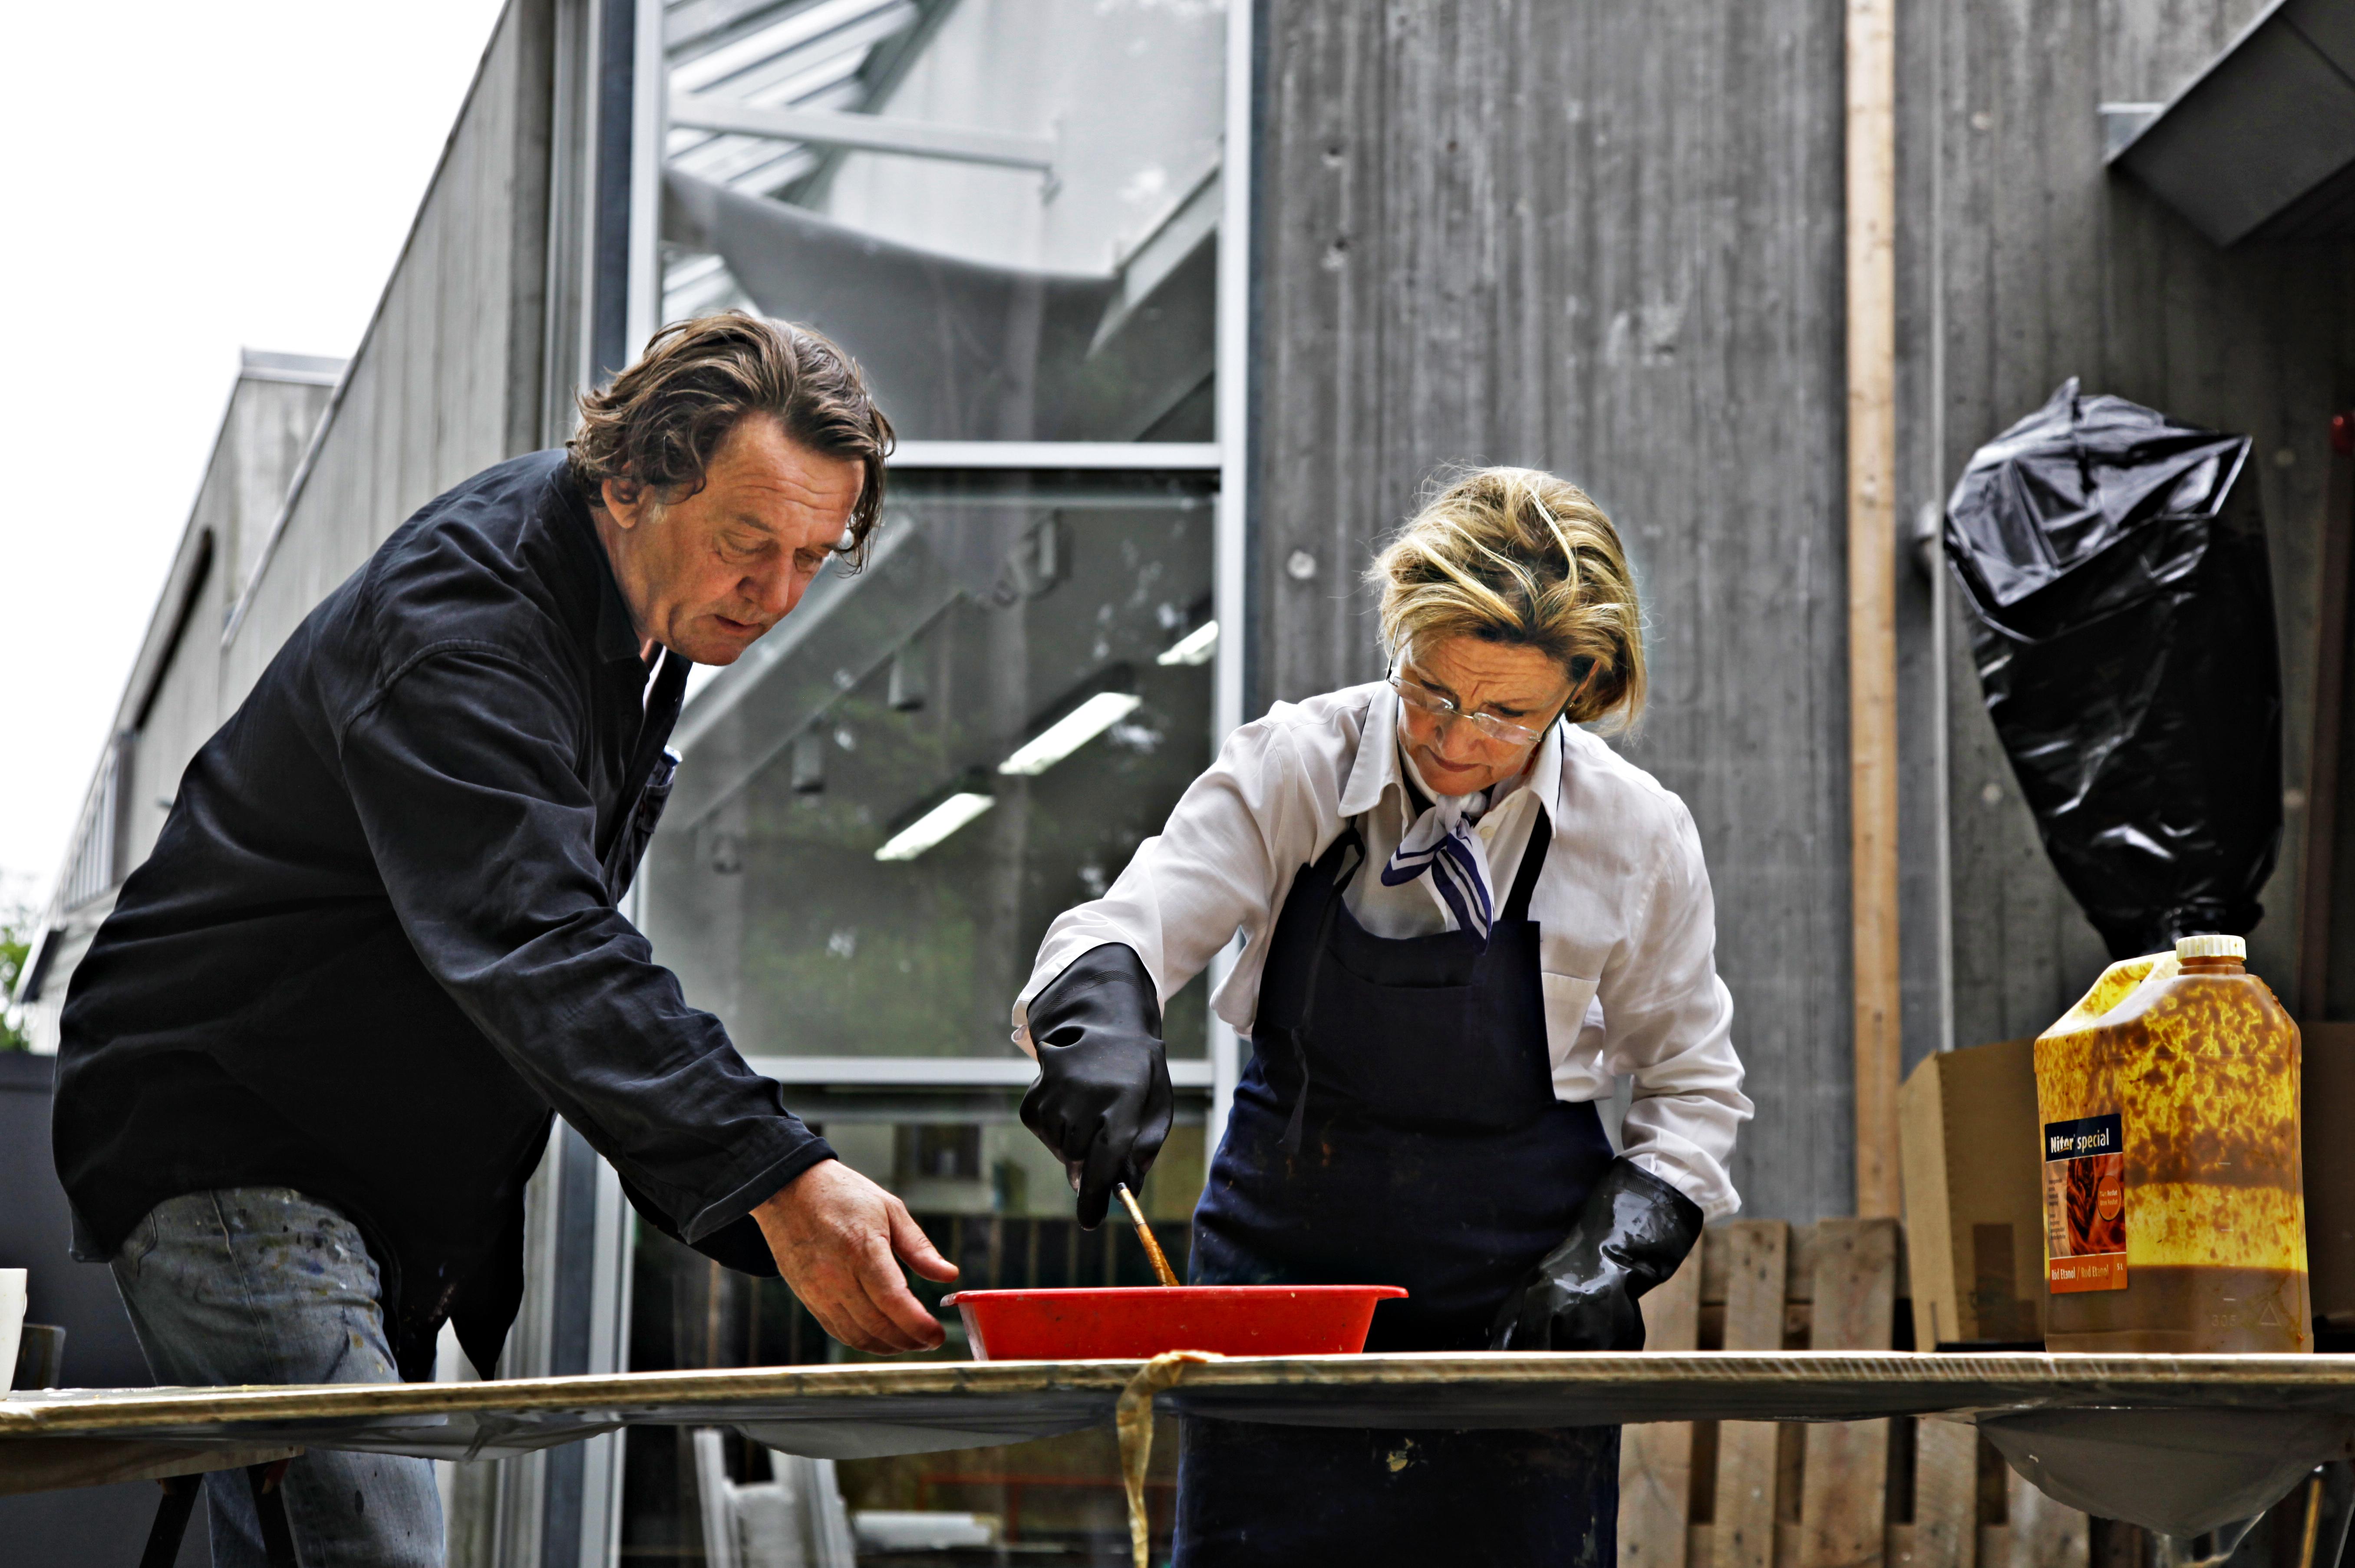 The Queen works with Kjell Nupen on an art piece. Photo: Rolf M. Aagaard / Det kongelige hoff.